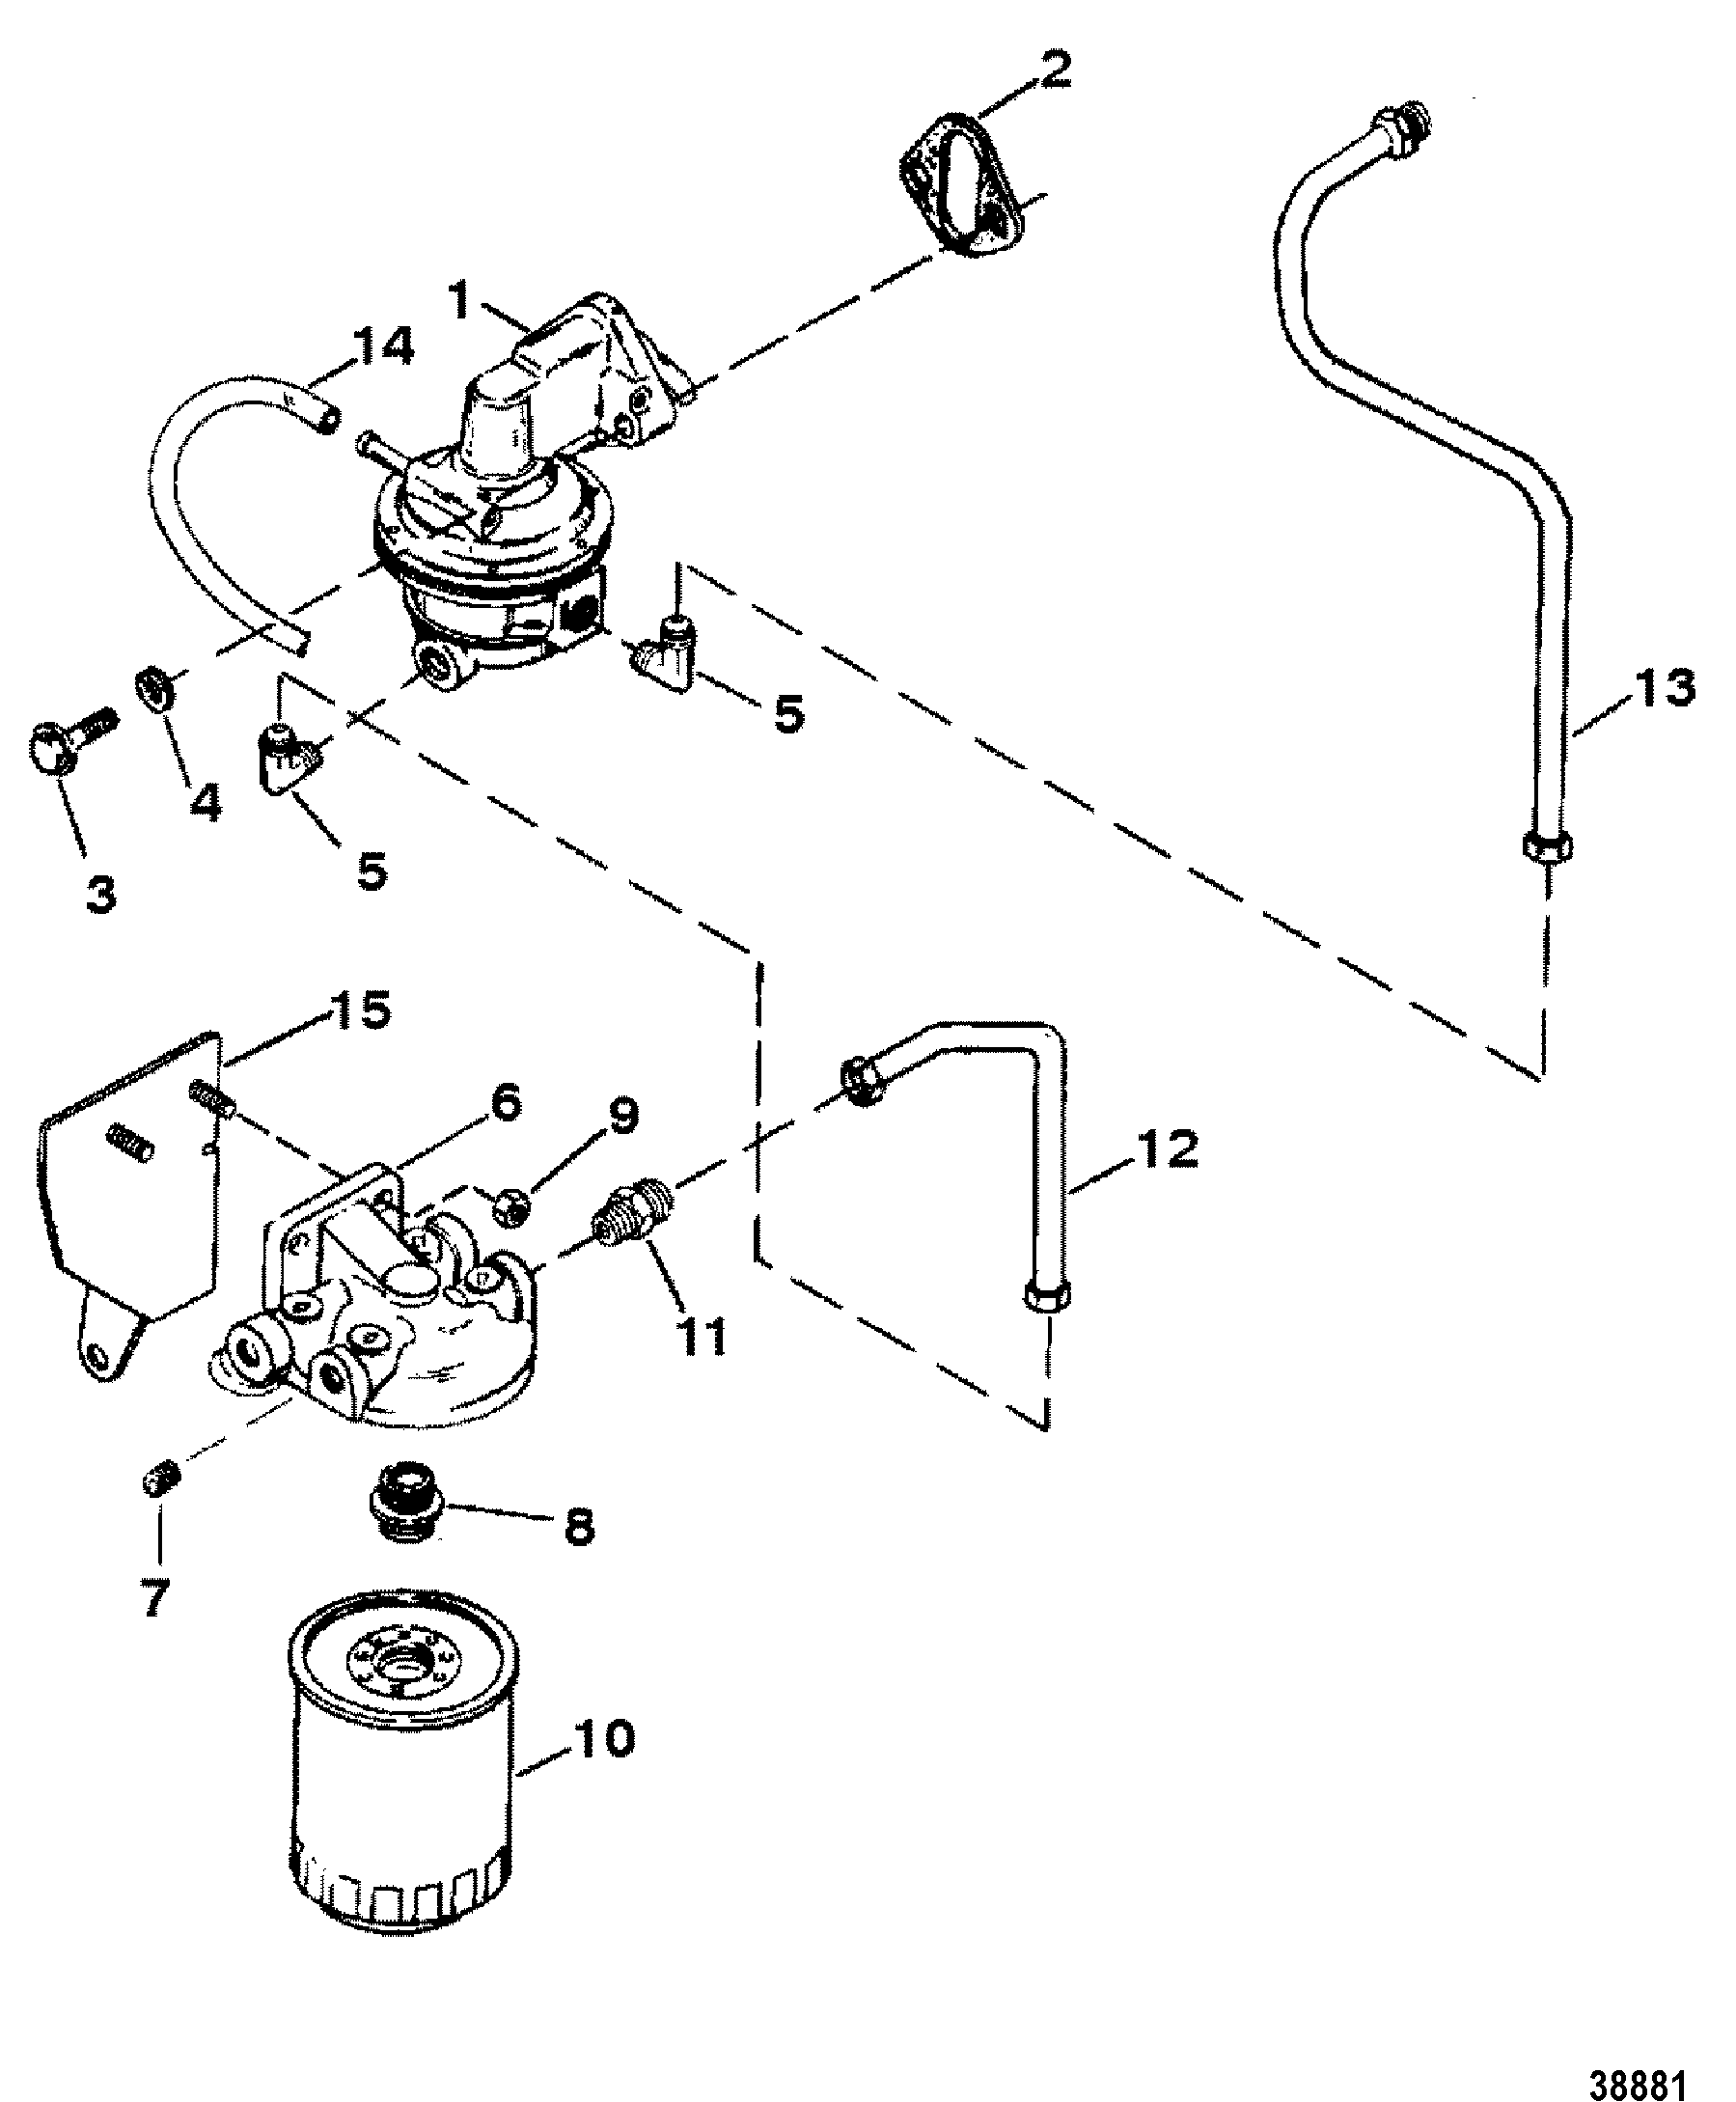 2002 mercury 225 efi fuel filter